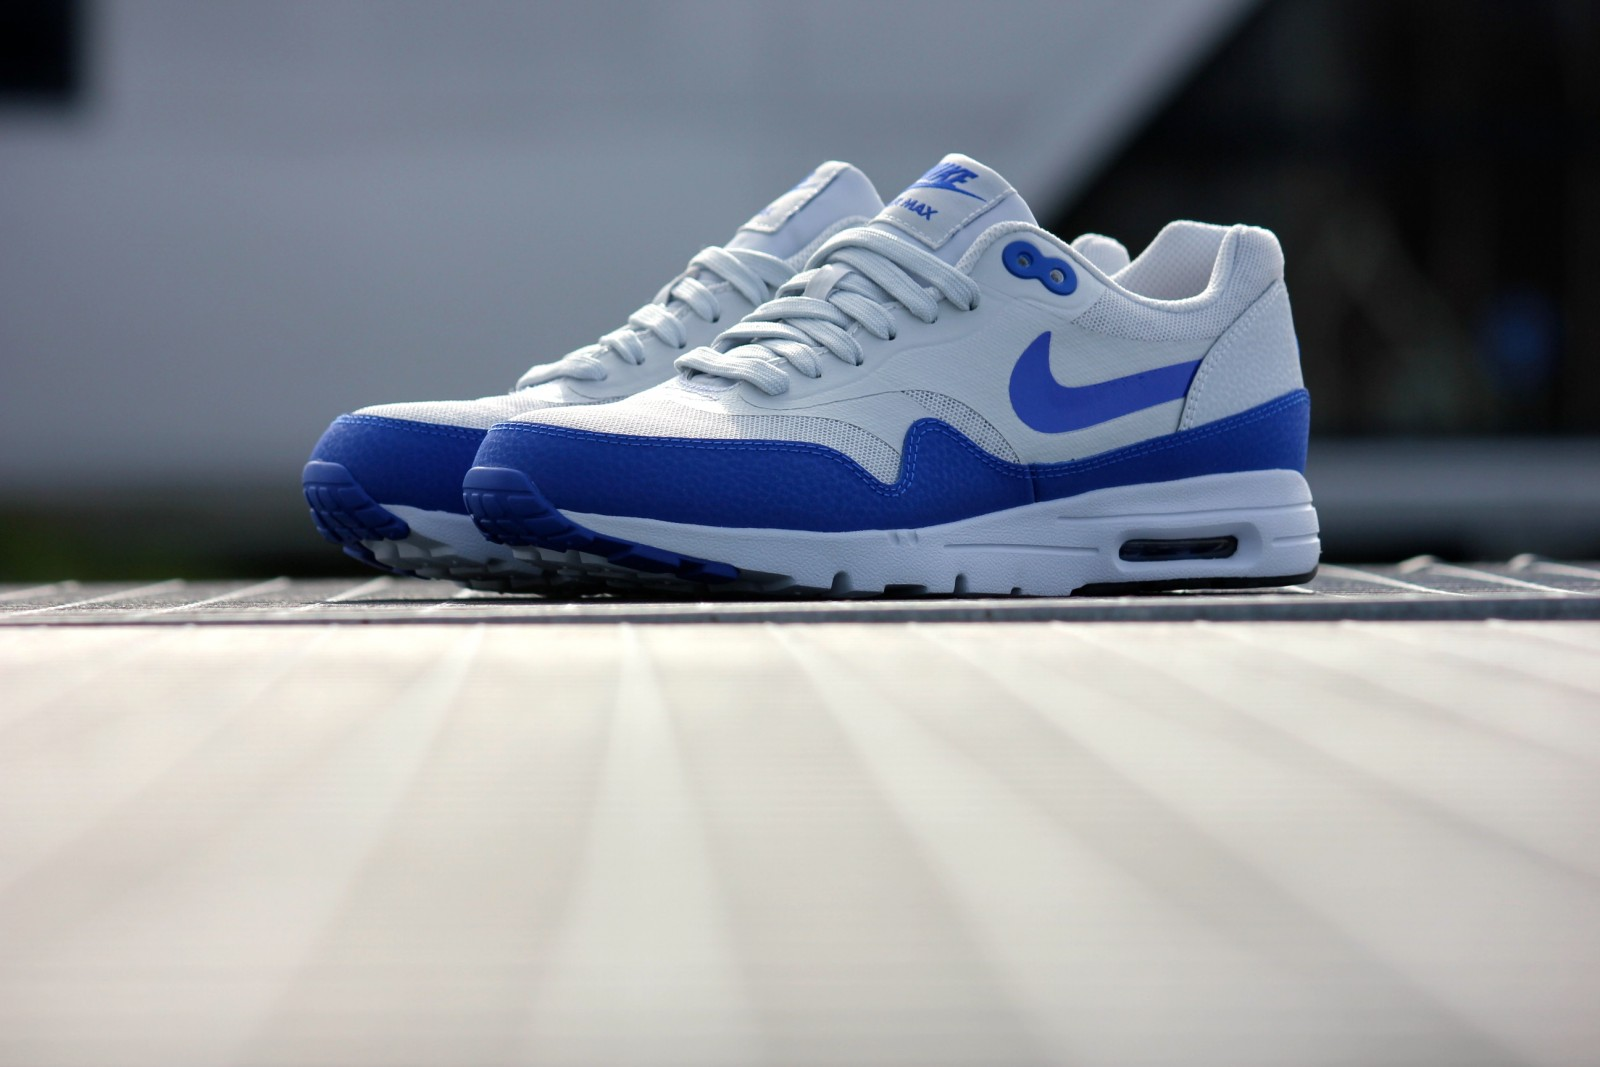 Nike Air Max 1 Ultra Essential OG Blue | SneakerFiles